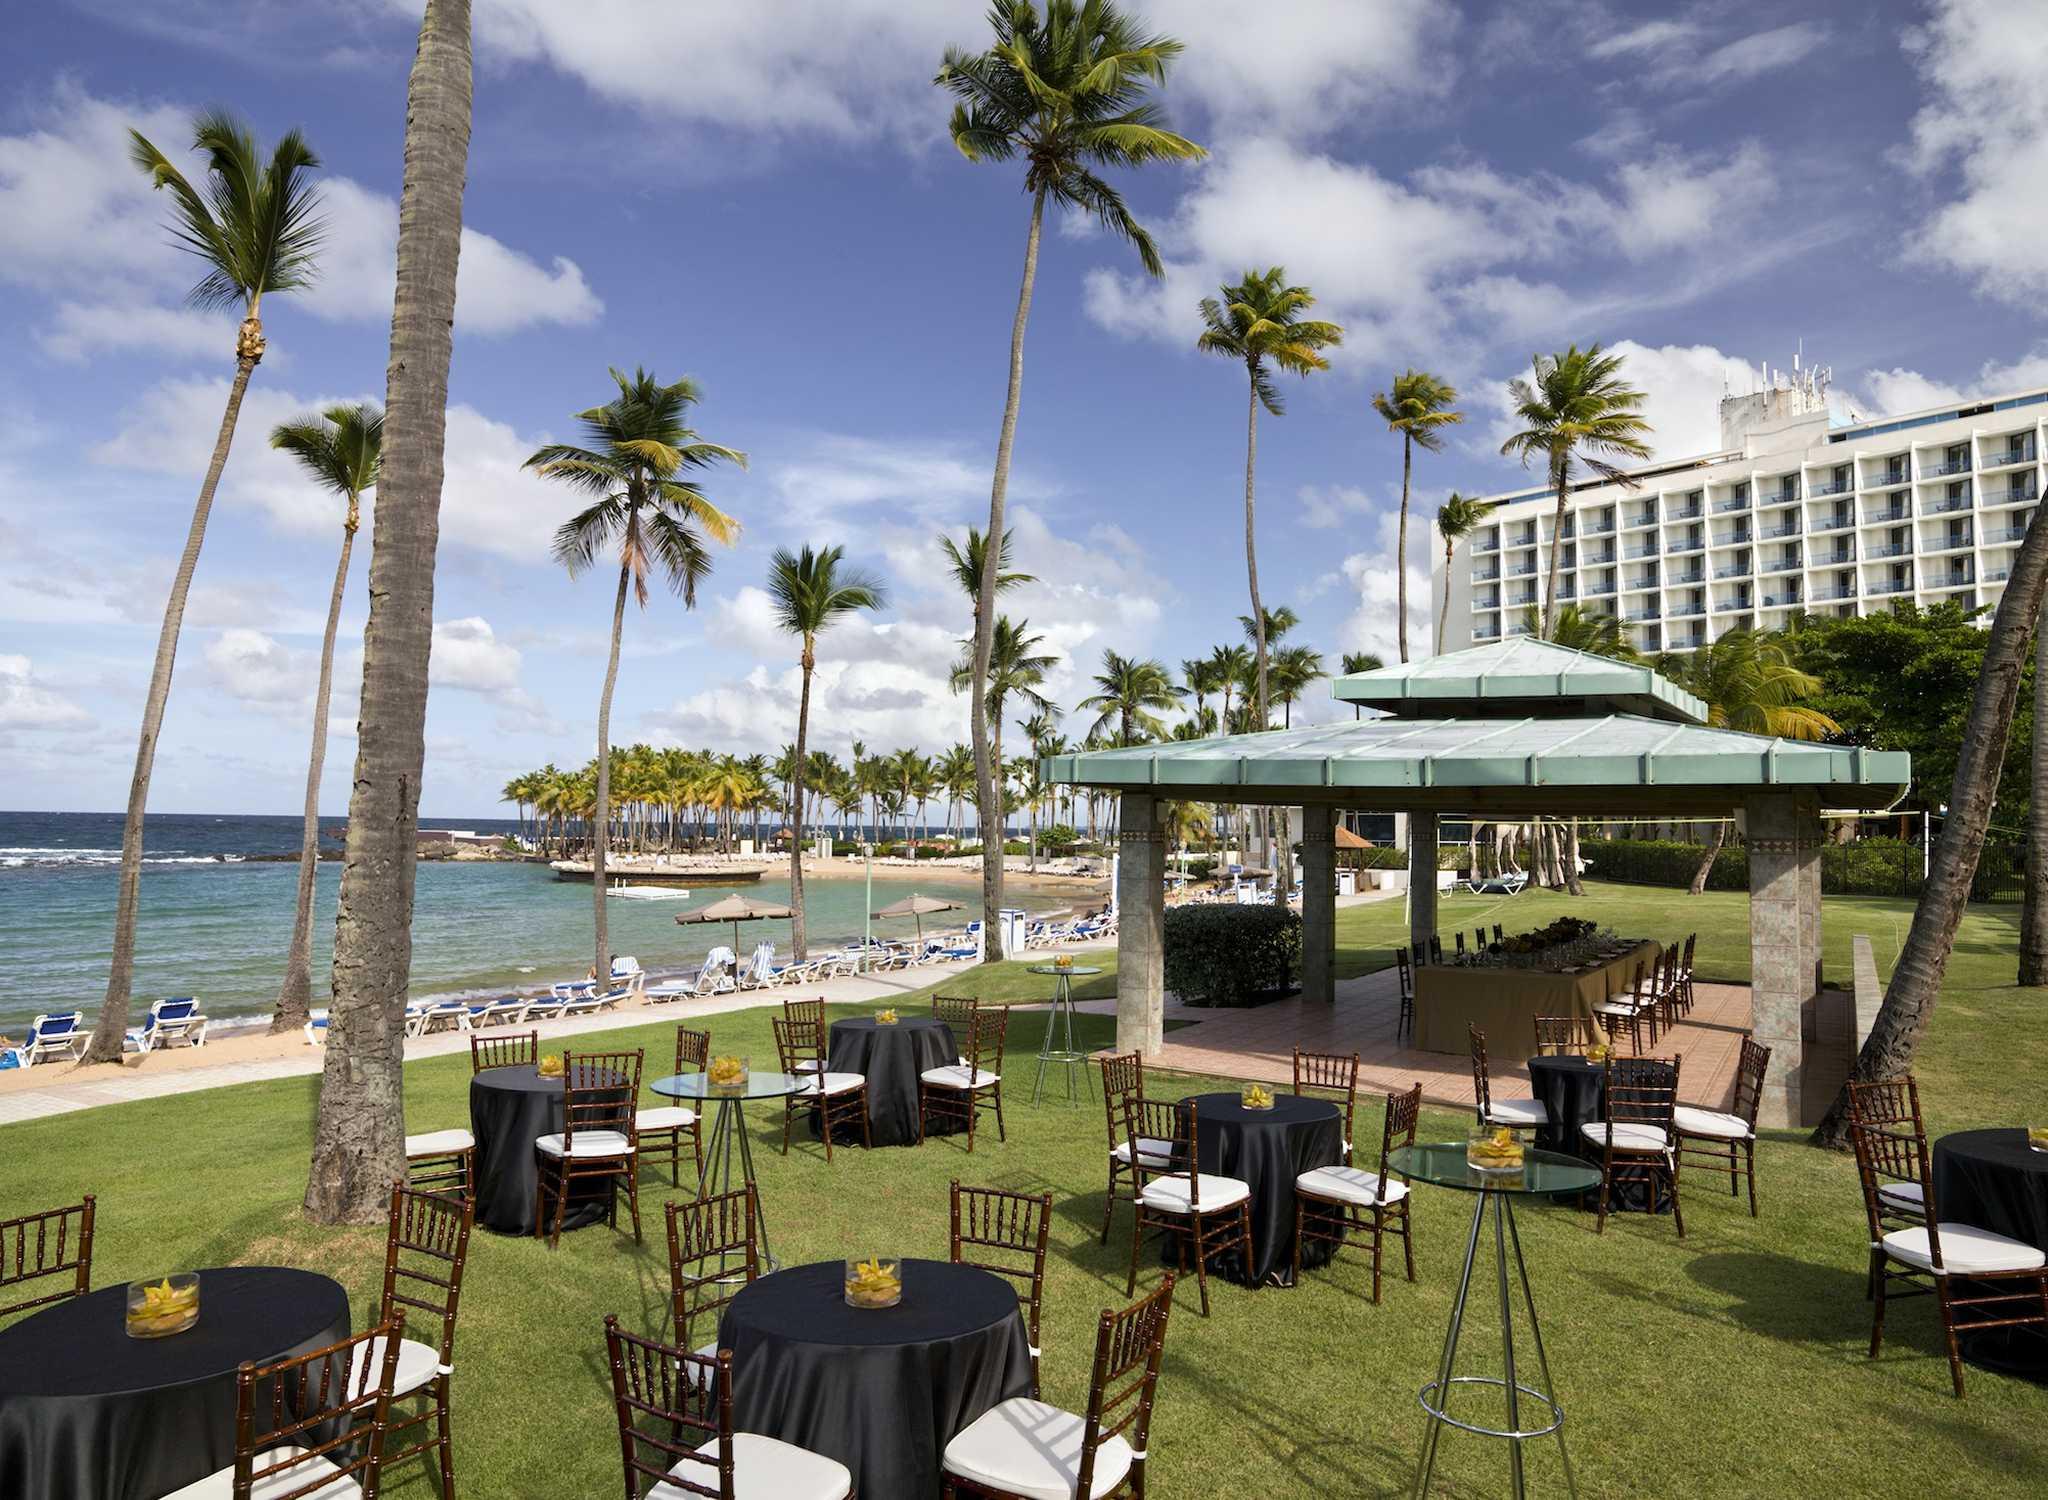 Hoteis e resorts em porto rico san juan hilton for Armadi california porto rico